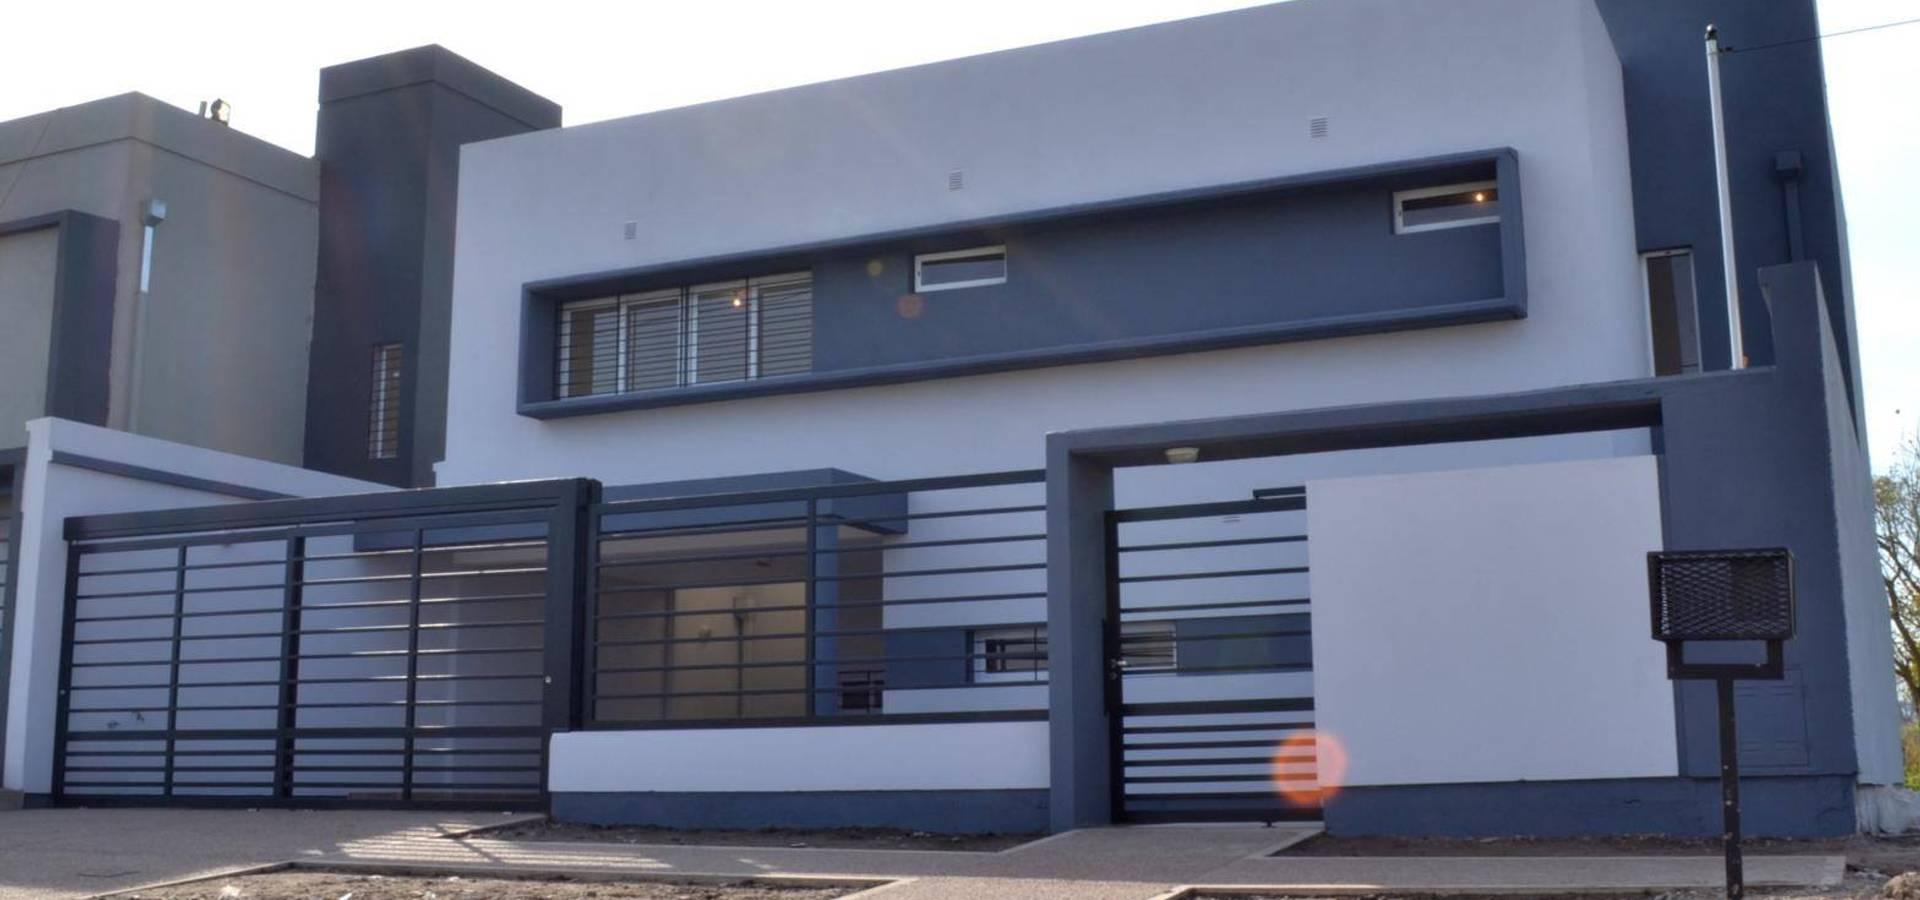 Alejandro Acevedo—Arquitectura